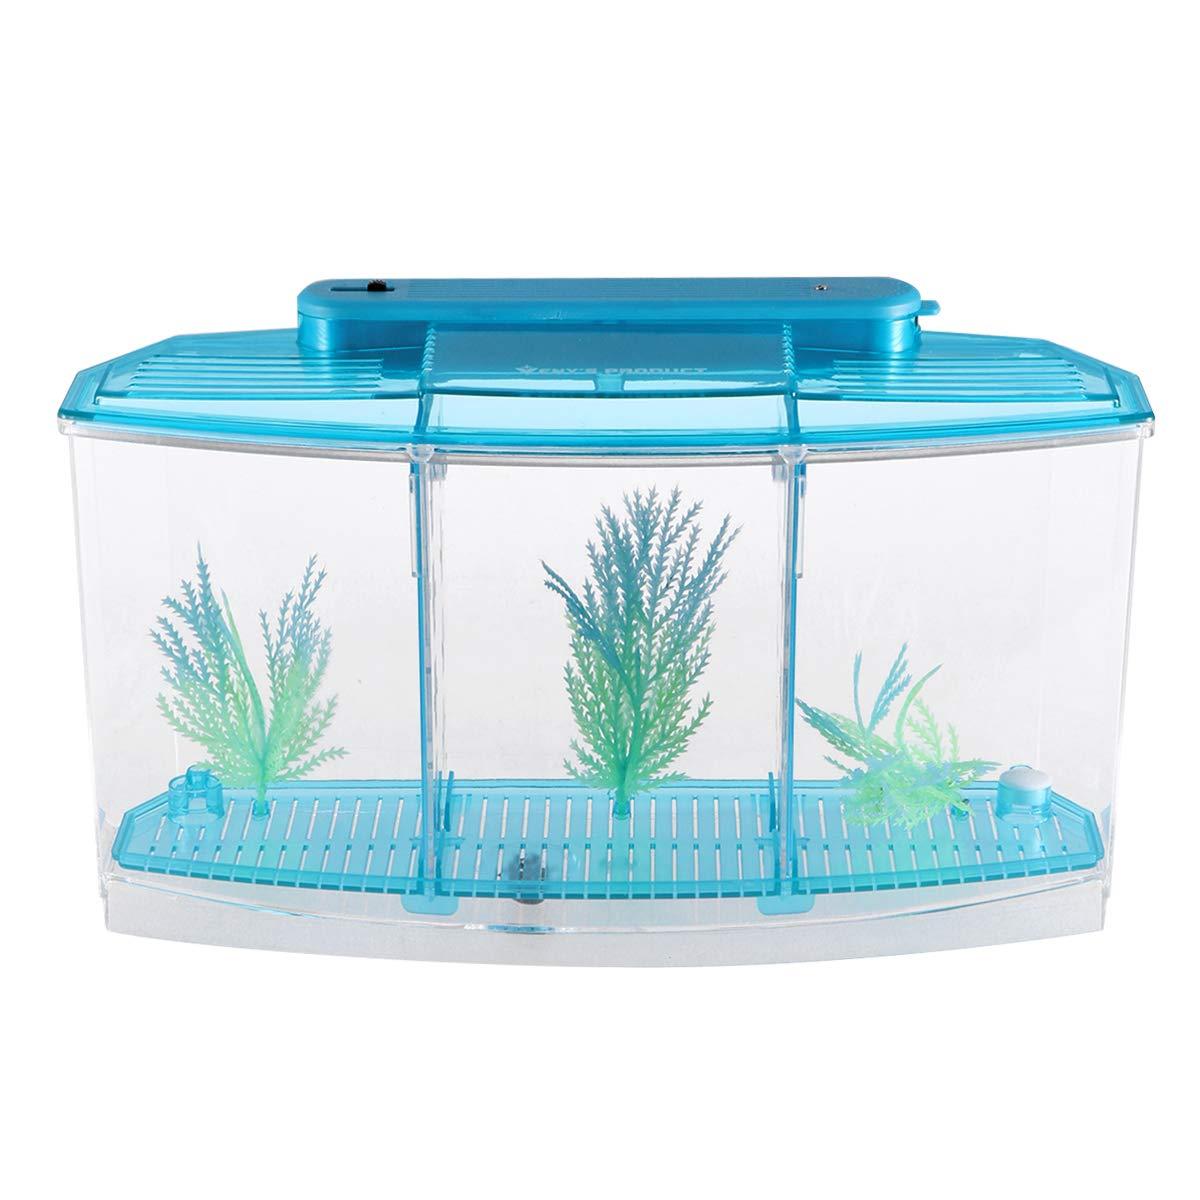 POPETPOP Mini Desktop Aquariums Fish Tank Ecological Goldfish Tank Hatchery Breeder Box for Living Office and Home dÃcor(Blue) by POPETPOP (Image #2)